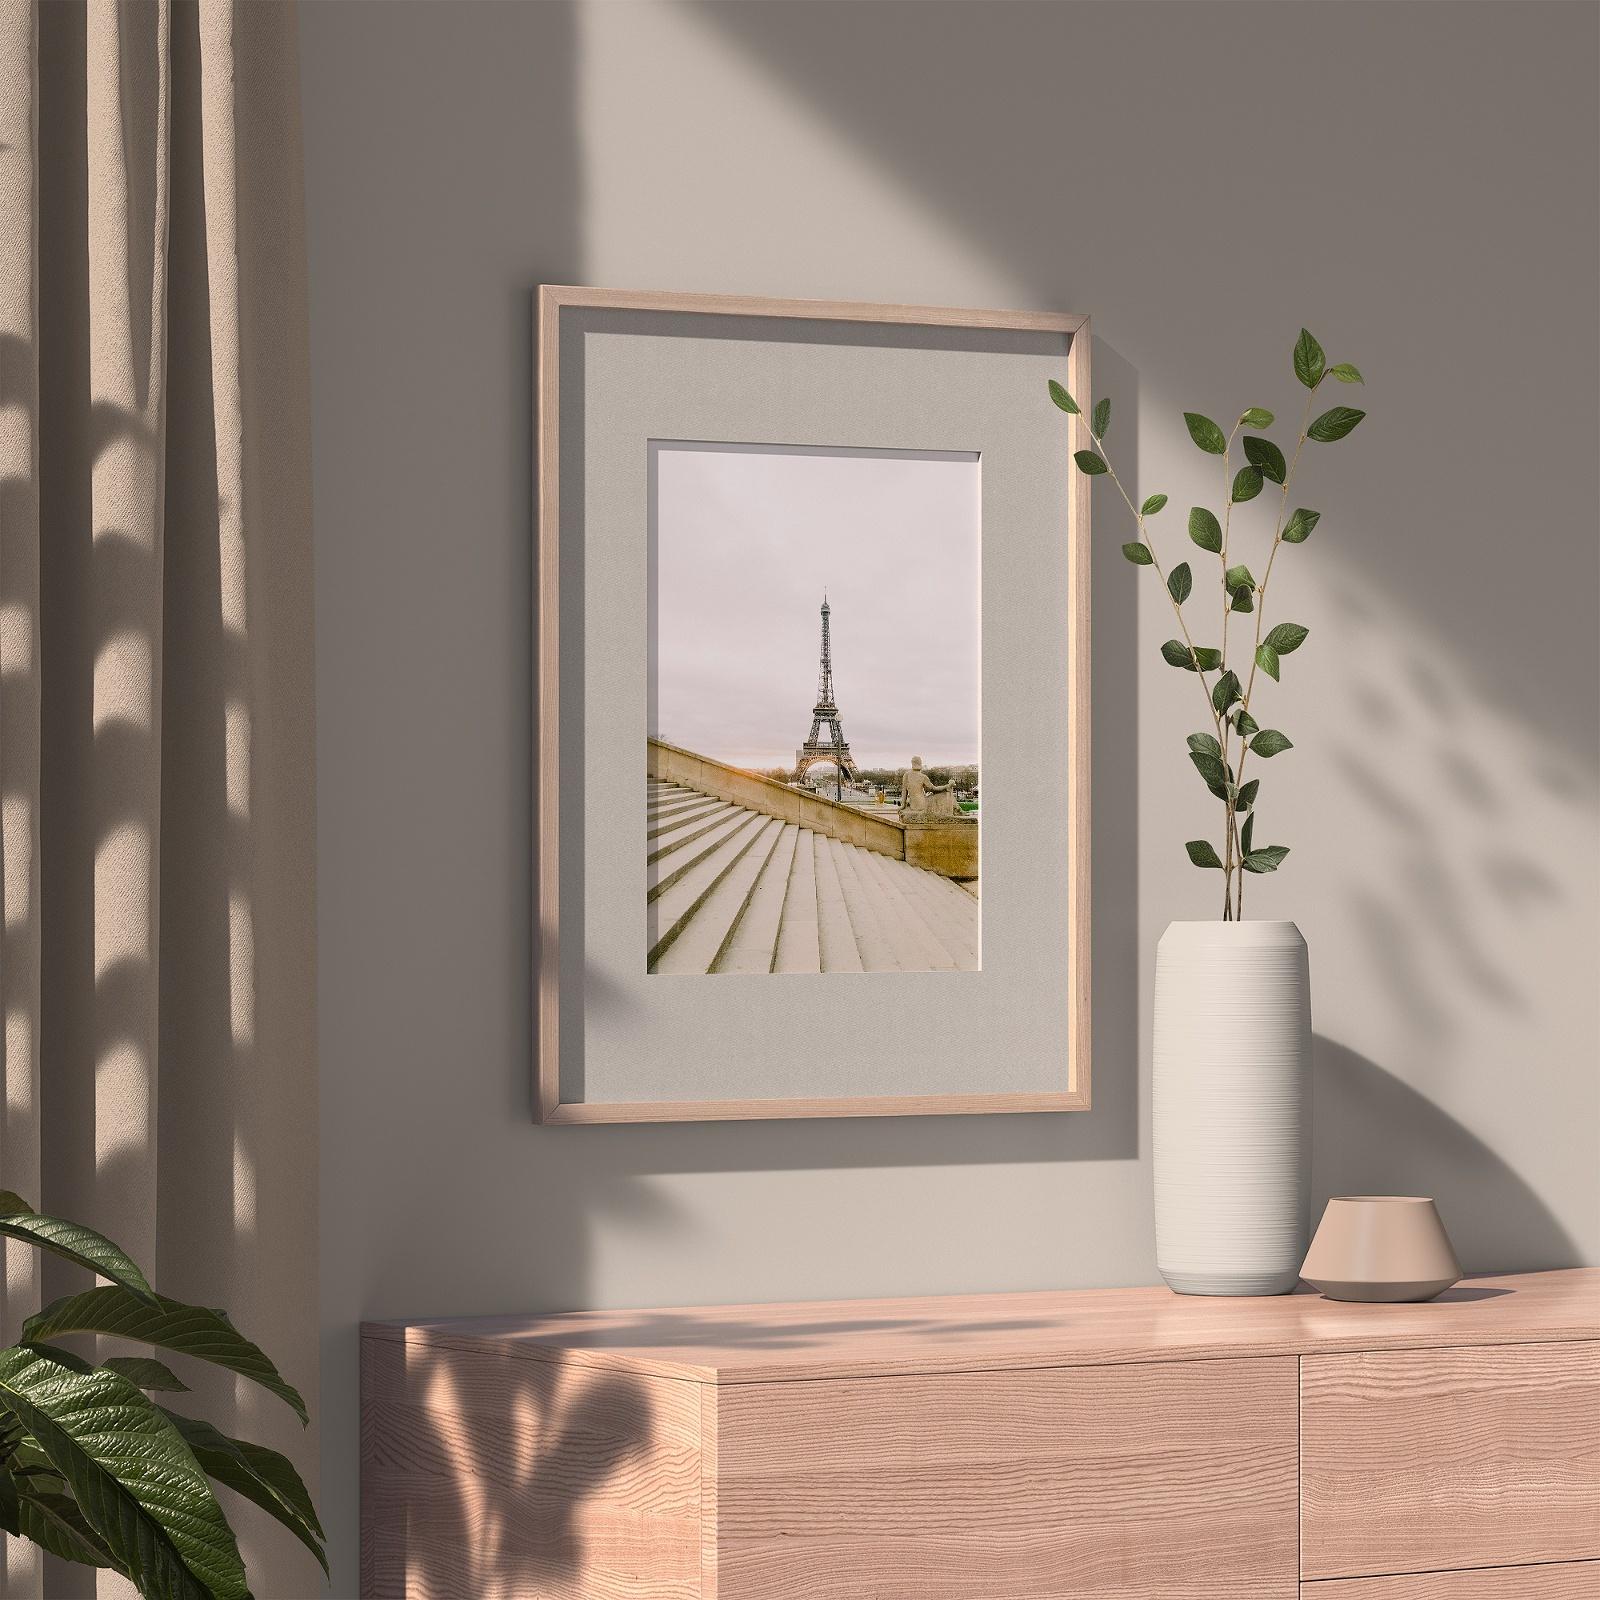 Oak framed photo of Paris Eiffel Tower